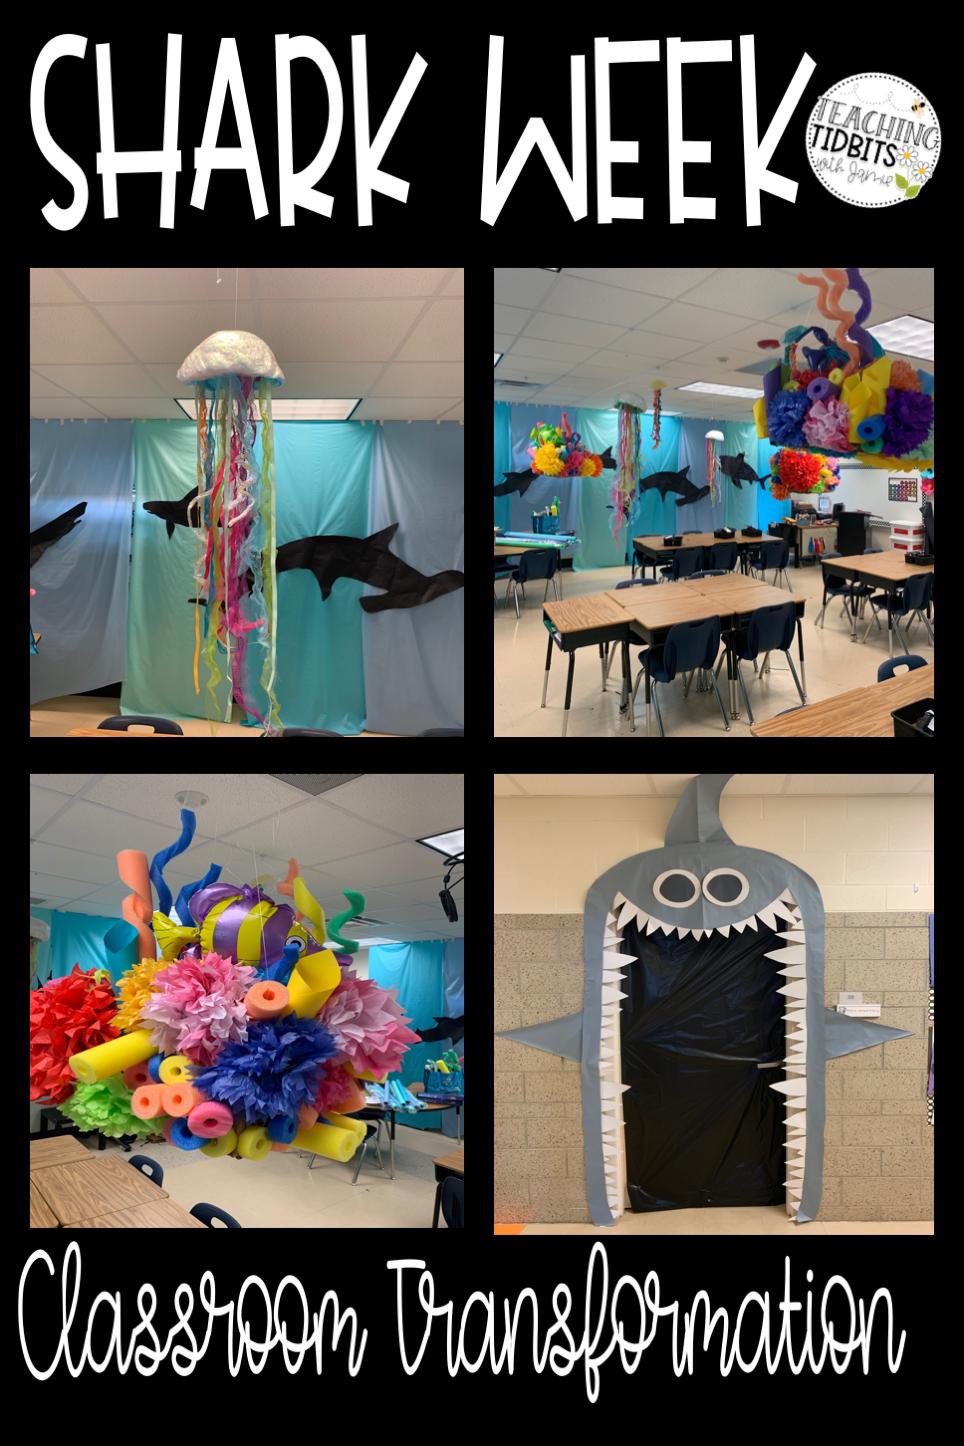 Shark Activities for the Classroom - Teaching Tidbits with Jamie - Shark Week Activities for the c